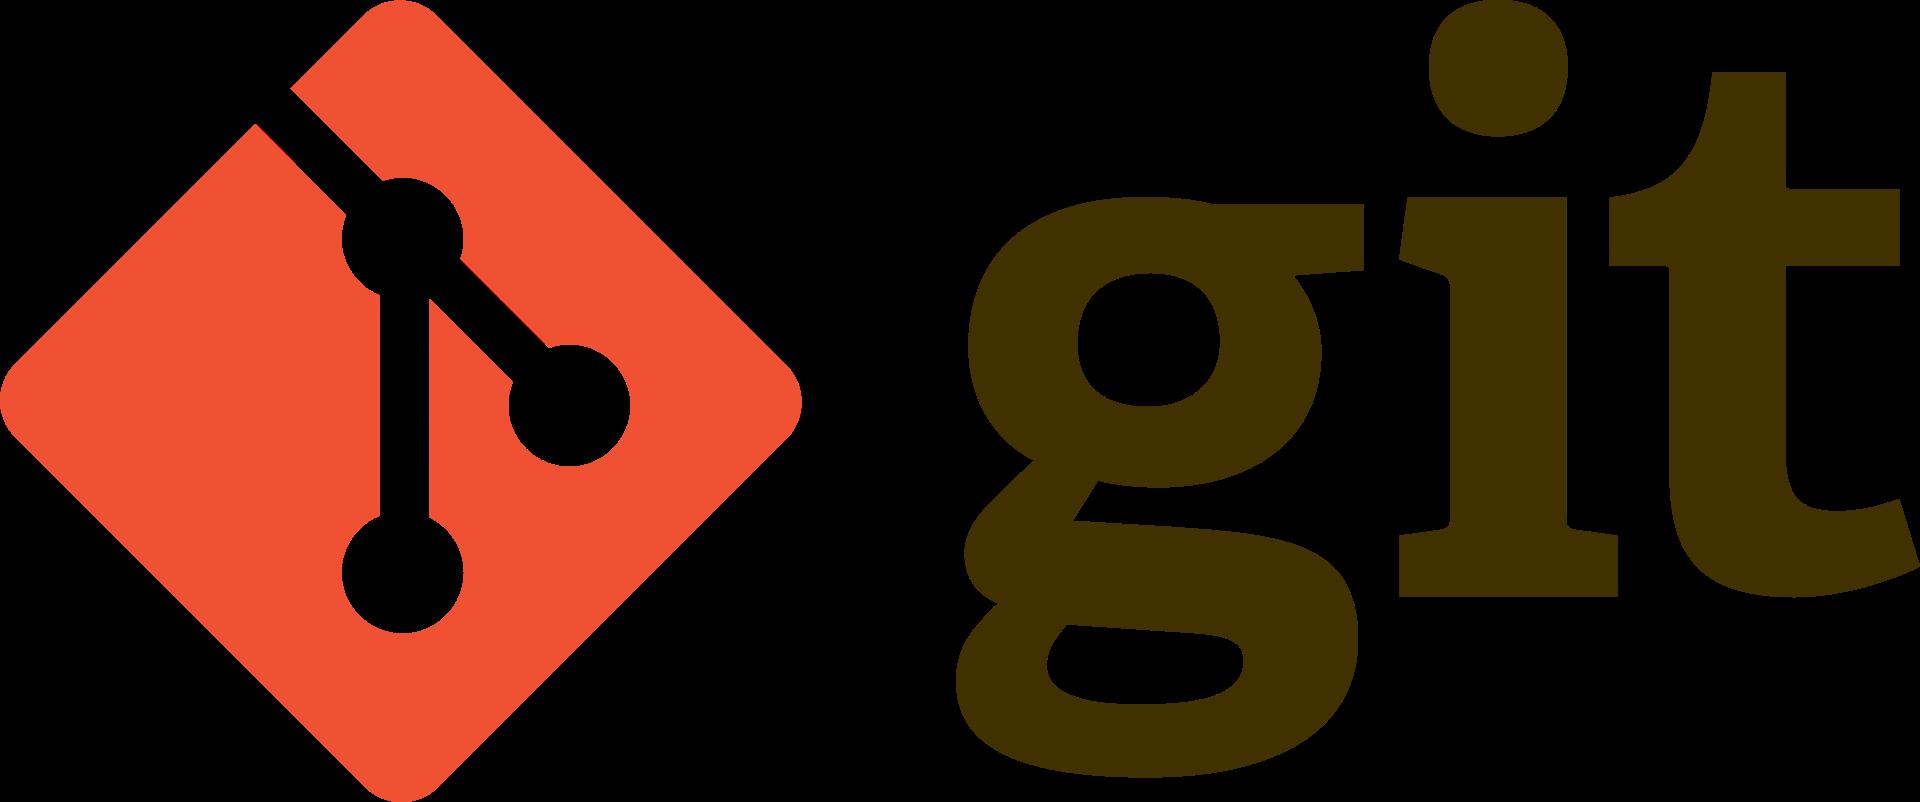 1920px-Git-logo.svg.png